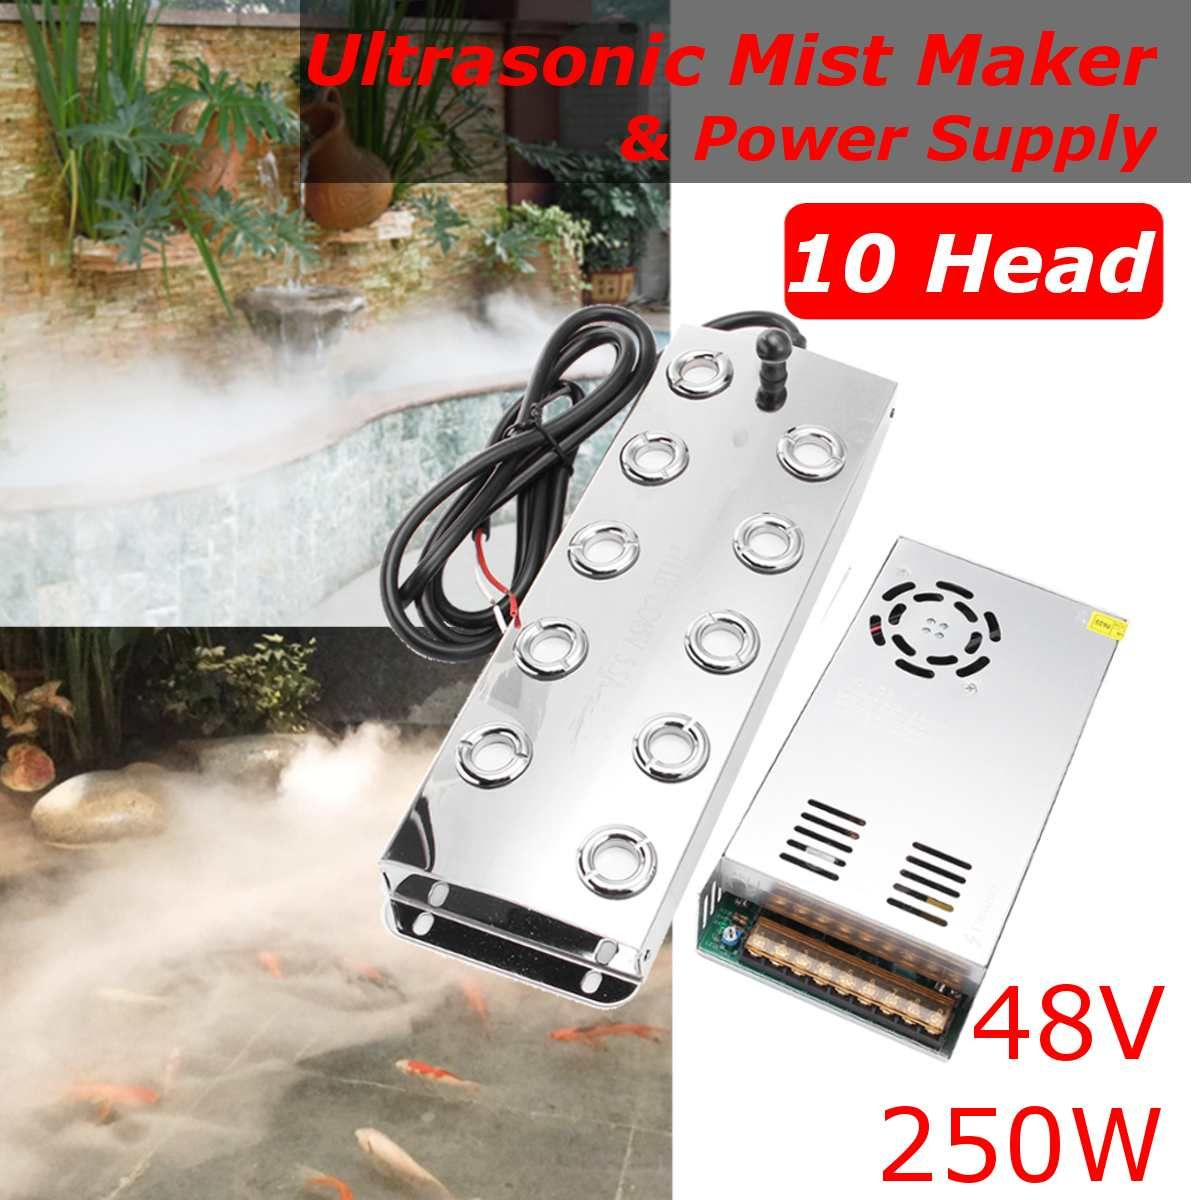 Neueste 10 Kopf 5000 ML/H Ultraschall Nebel Maker Fogger Edelstahl Luftbefeuchter Gewächshaus Aeromist Hydrokultur + Transformator